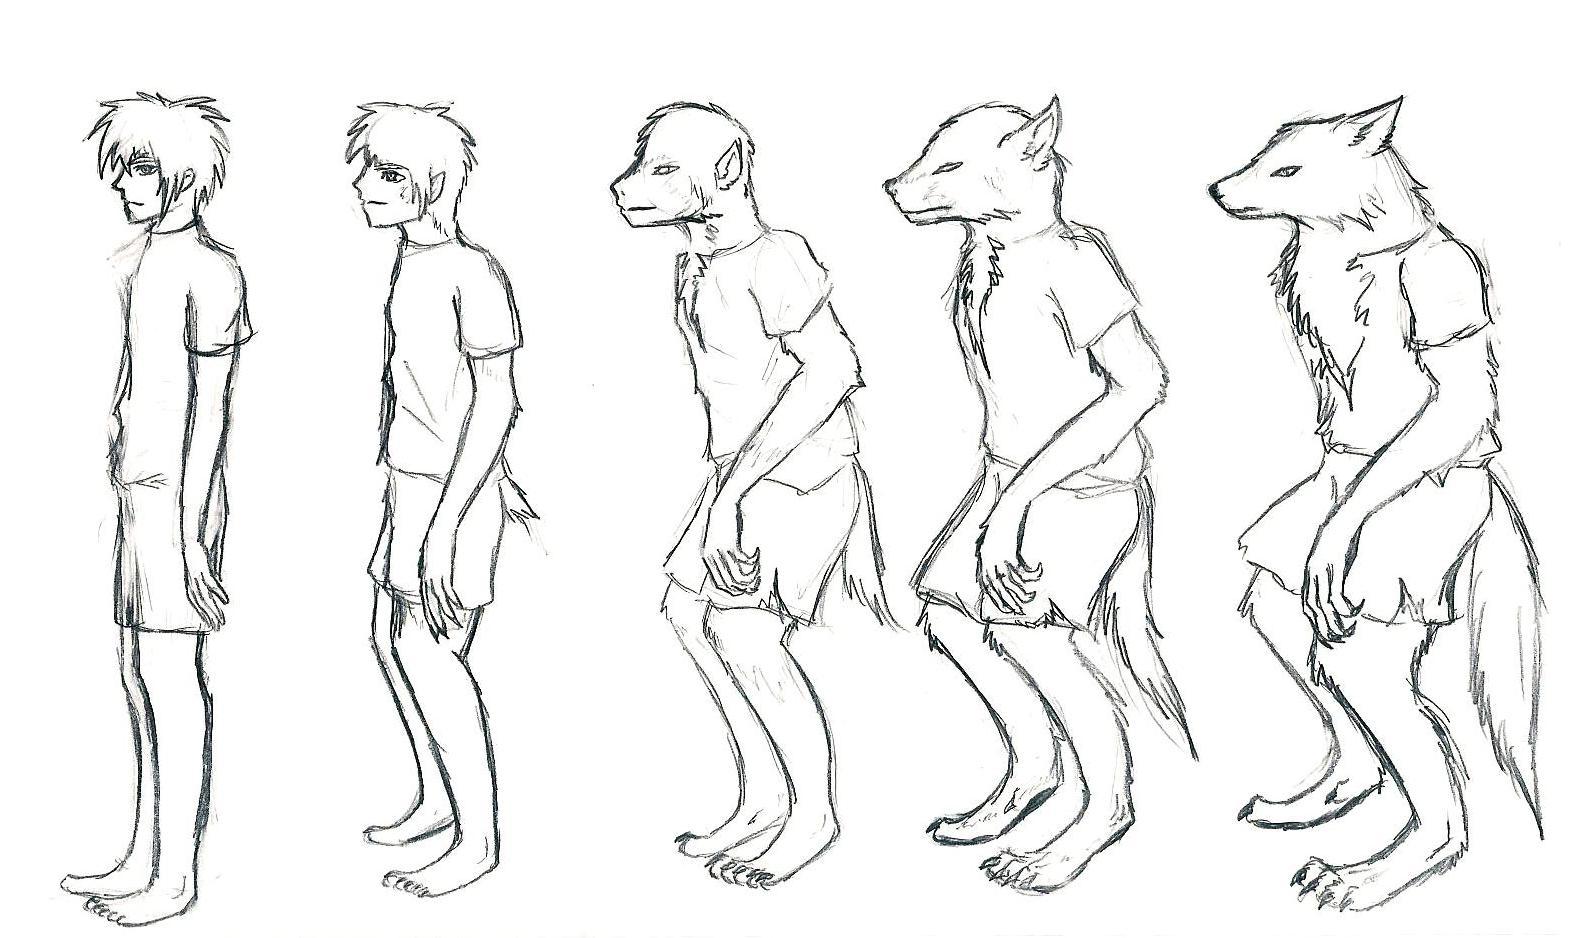 Werewolf Transformation Animation - YouTube  Werewolf Transformation Animation